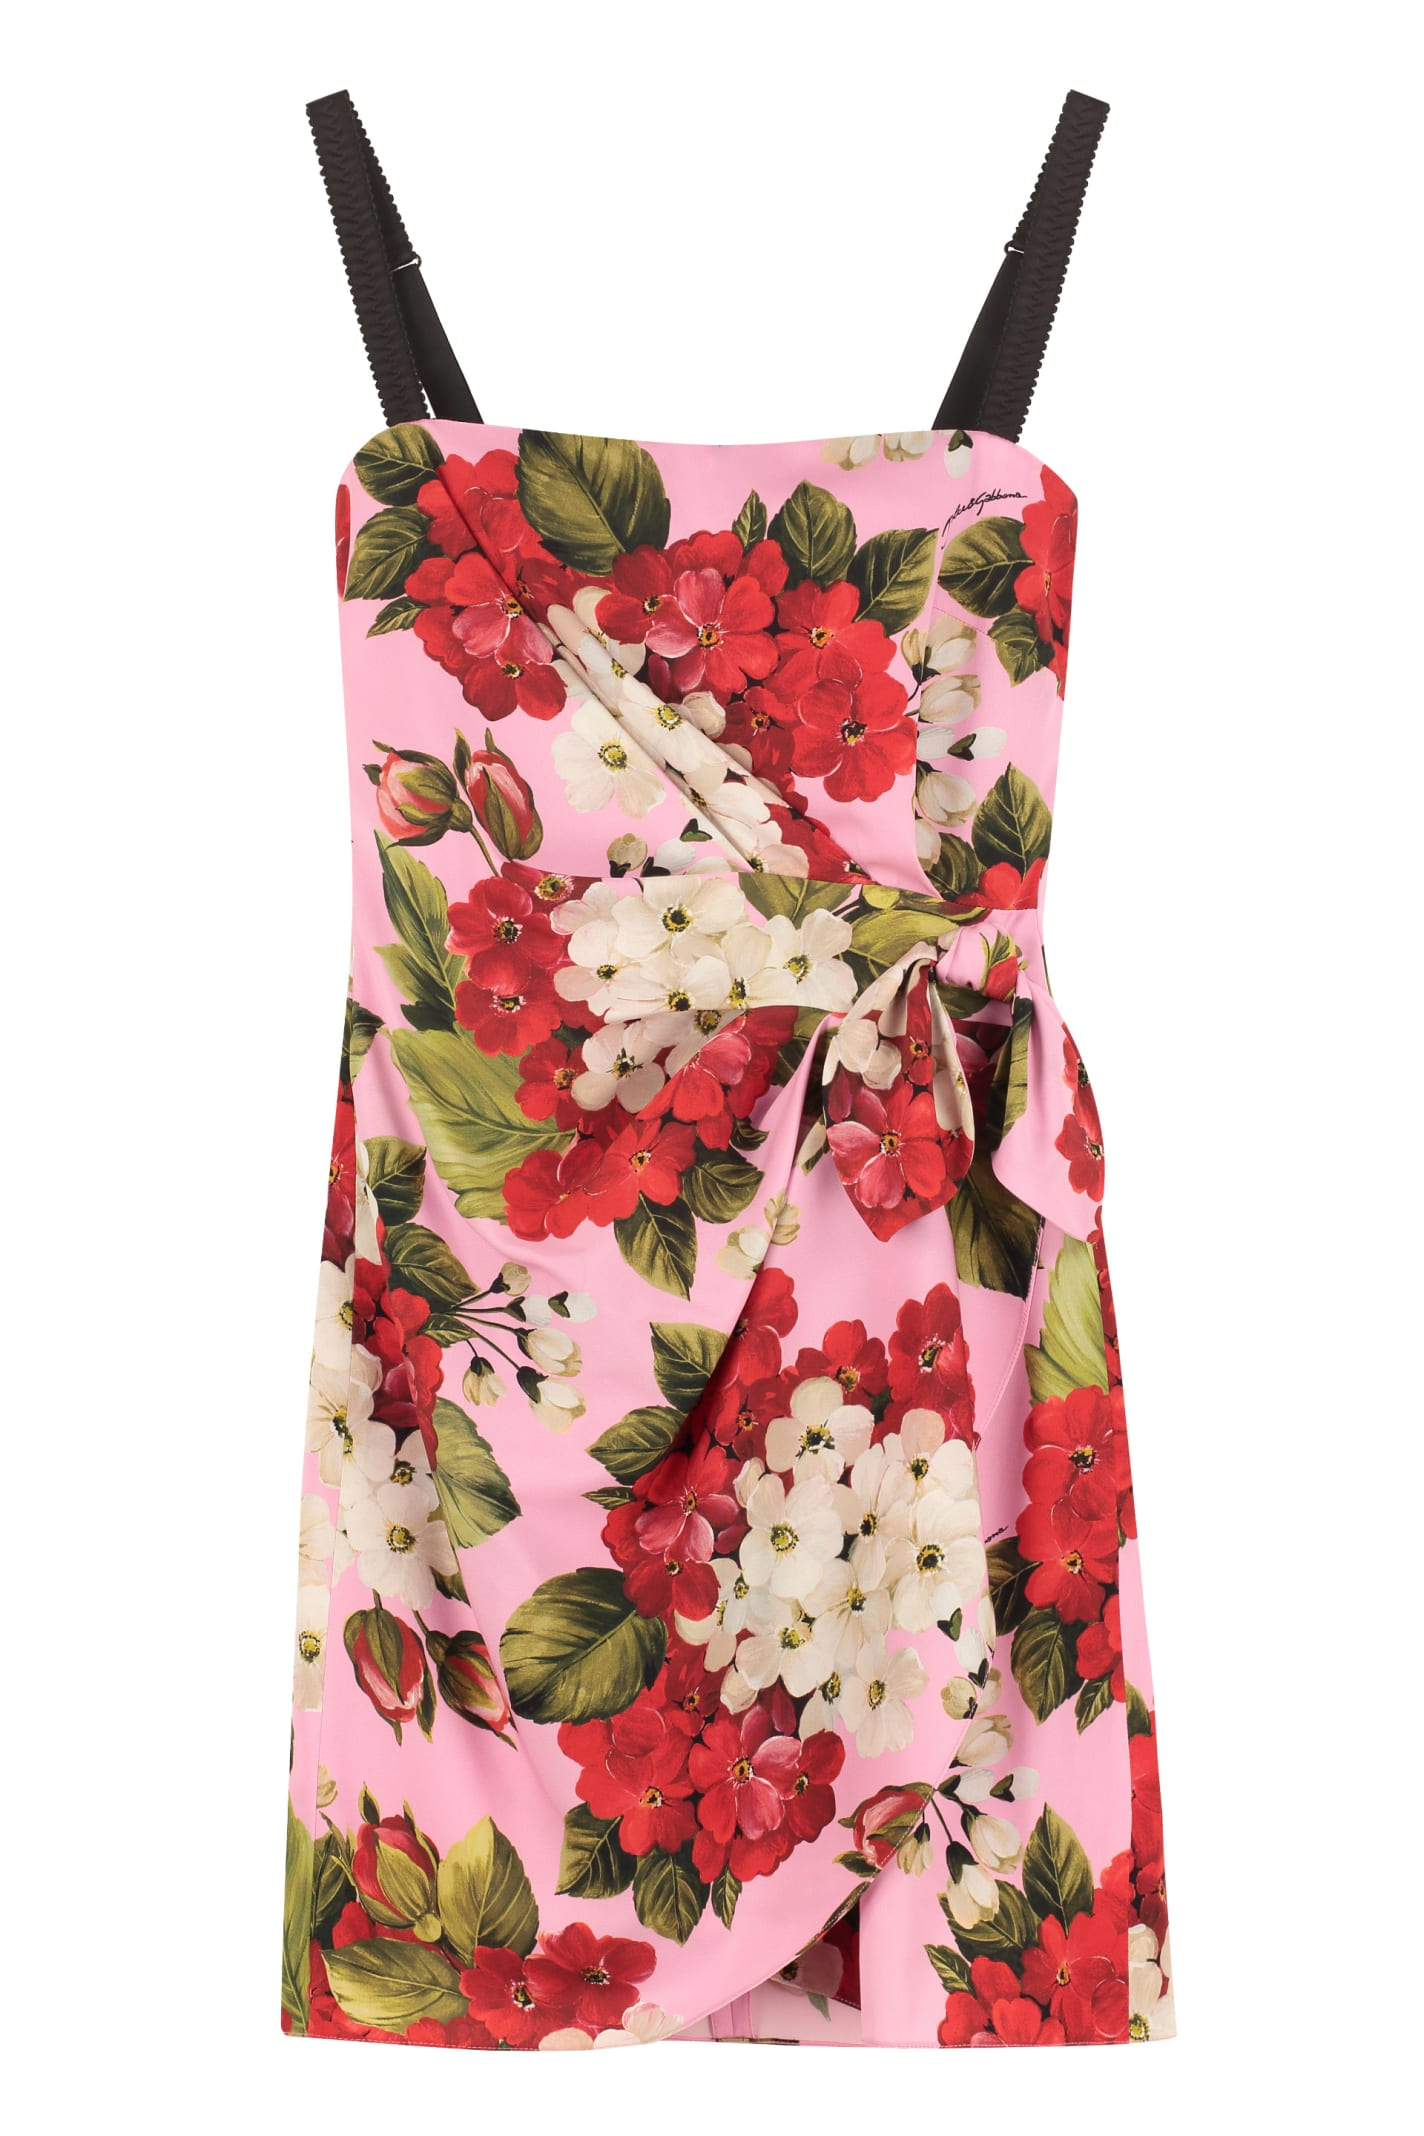 Dolce & Gabbana Printed Corset Dress